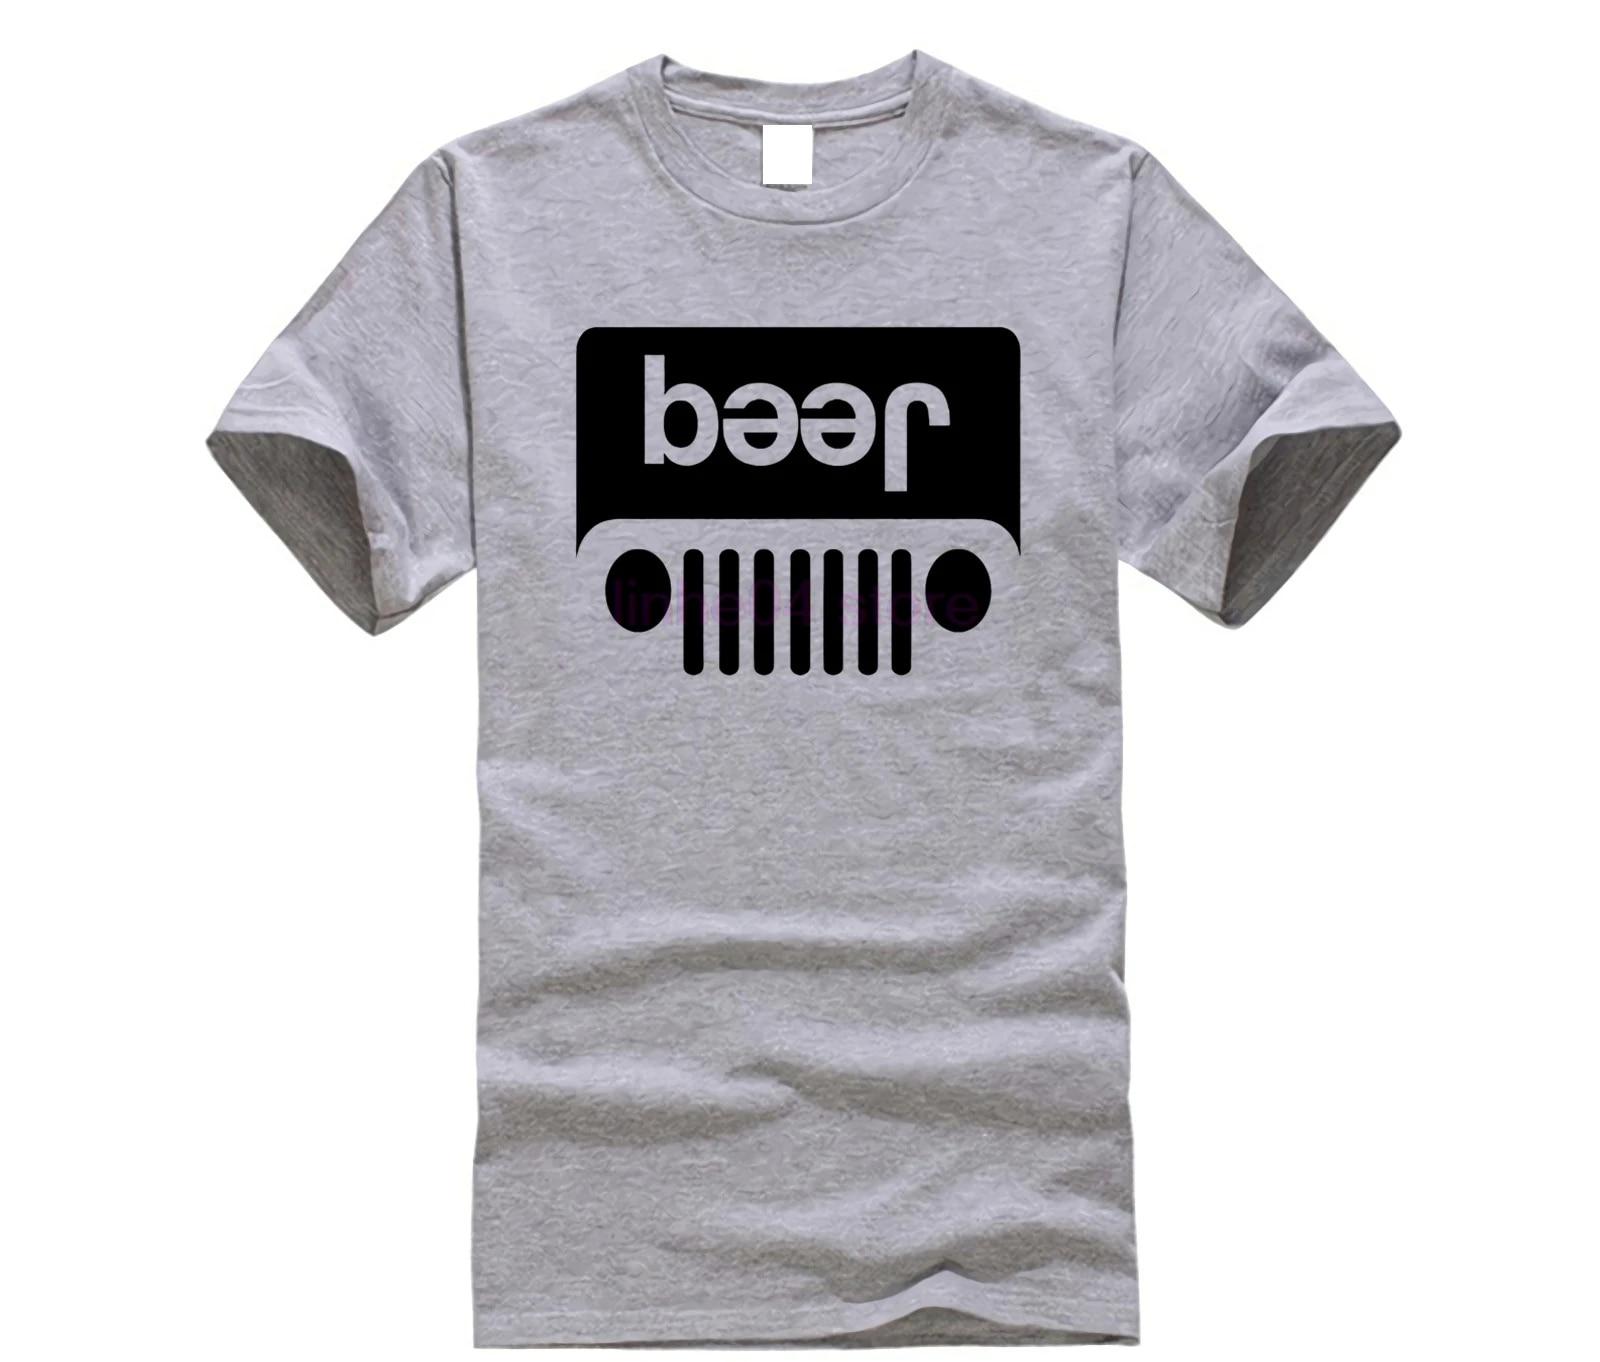 Funny Beer Parody Drinking Humor Mens Graphic T-Shirt Parody Tee